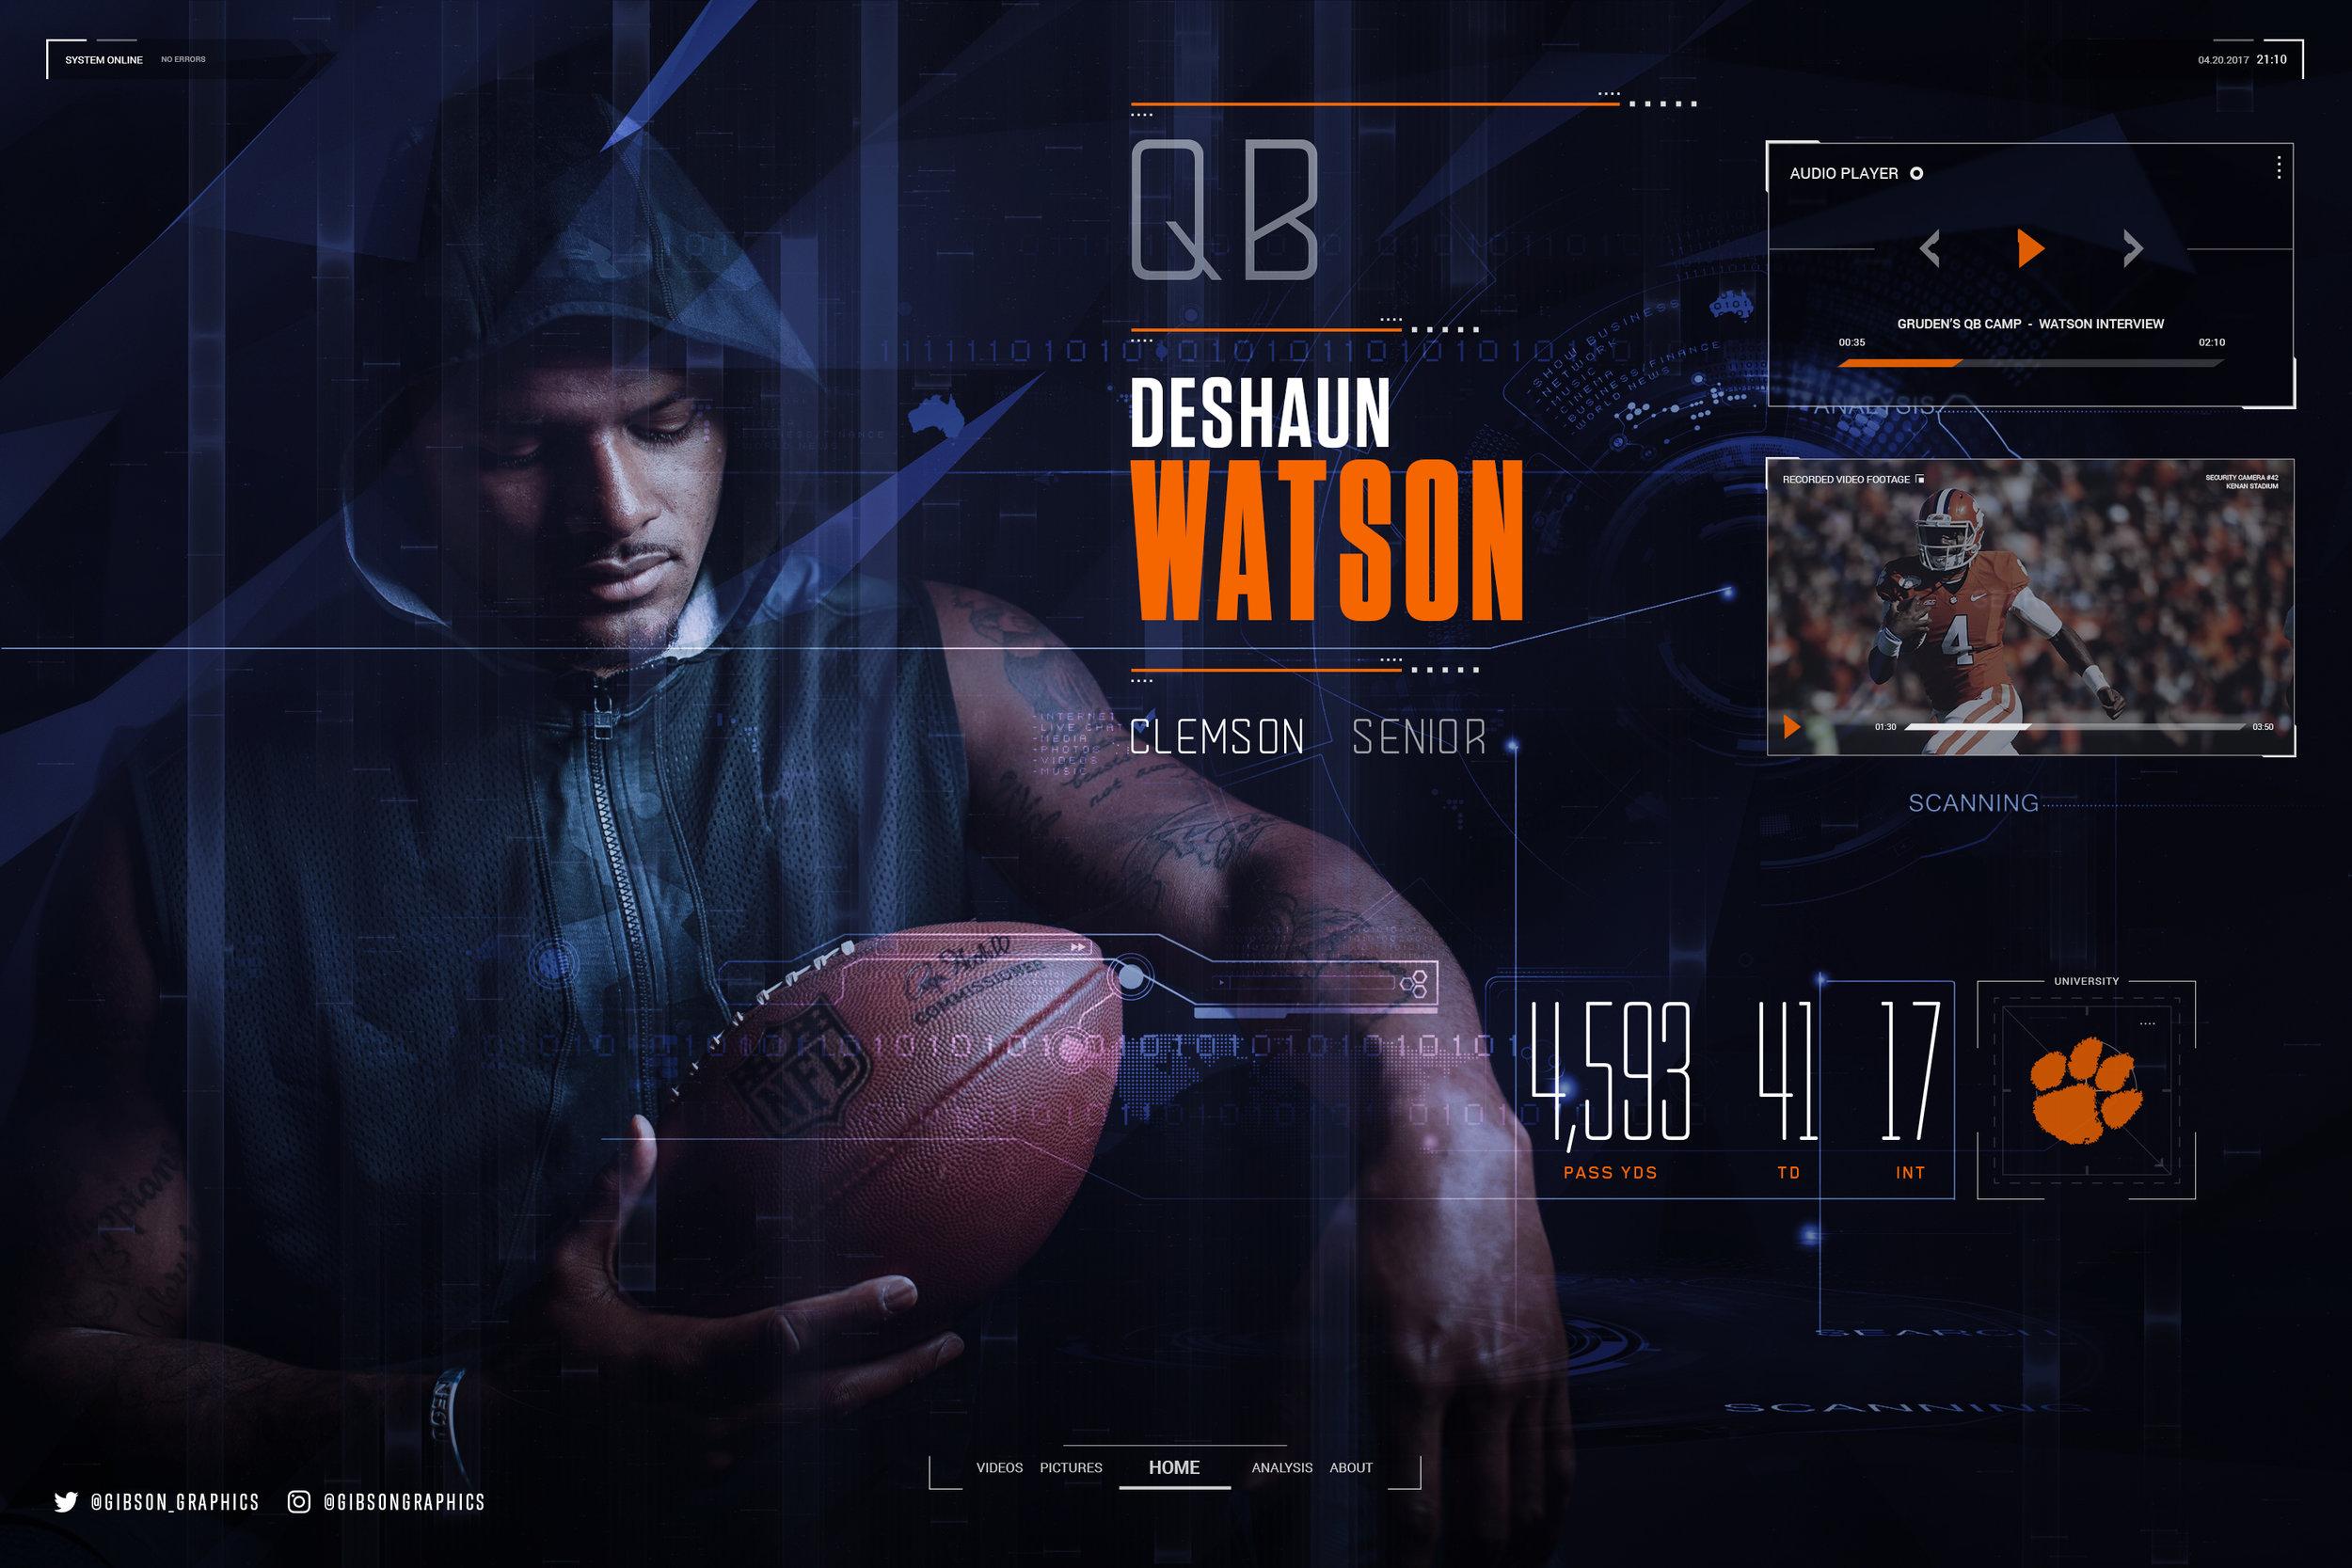 Deshaun Watson 2016 Clemson NFL Infographic